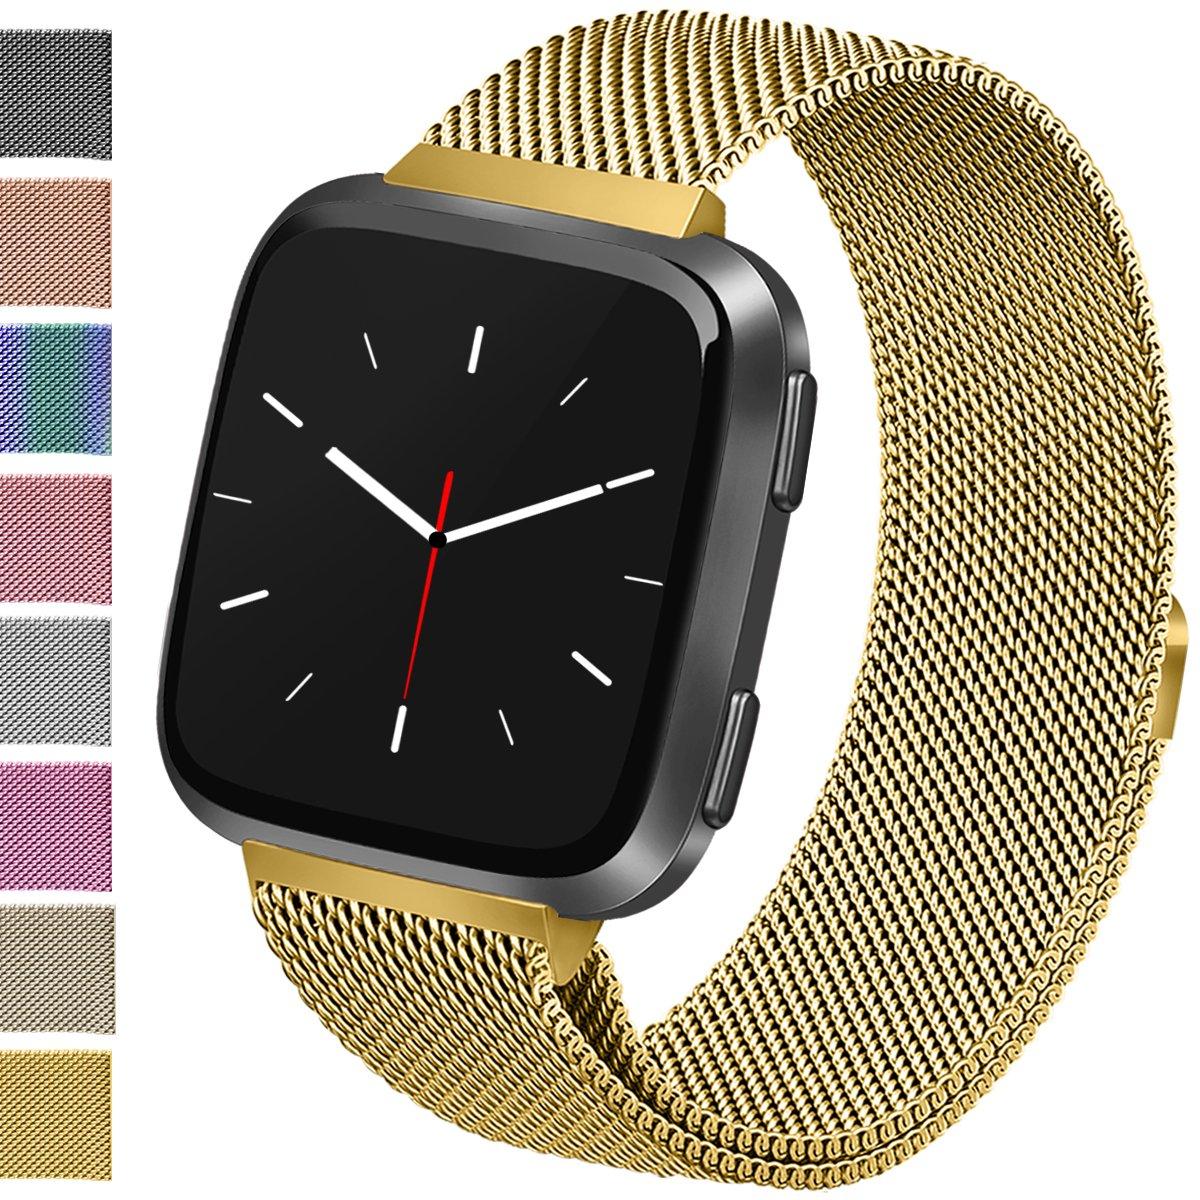 Vancle for Fitbit Versaバンド、ステンレススチールMilaneseメッシュループメタル交換用ブレスレットストラップwithマグネットロックfor Fitbit Versa Smart Watch Small|08 Gold 08 Gold Small B07C4KVNND